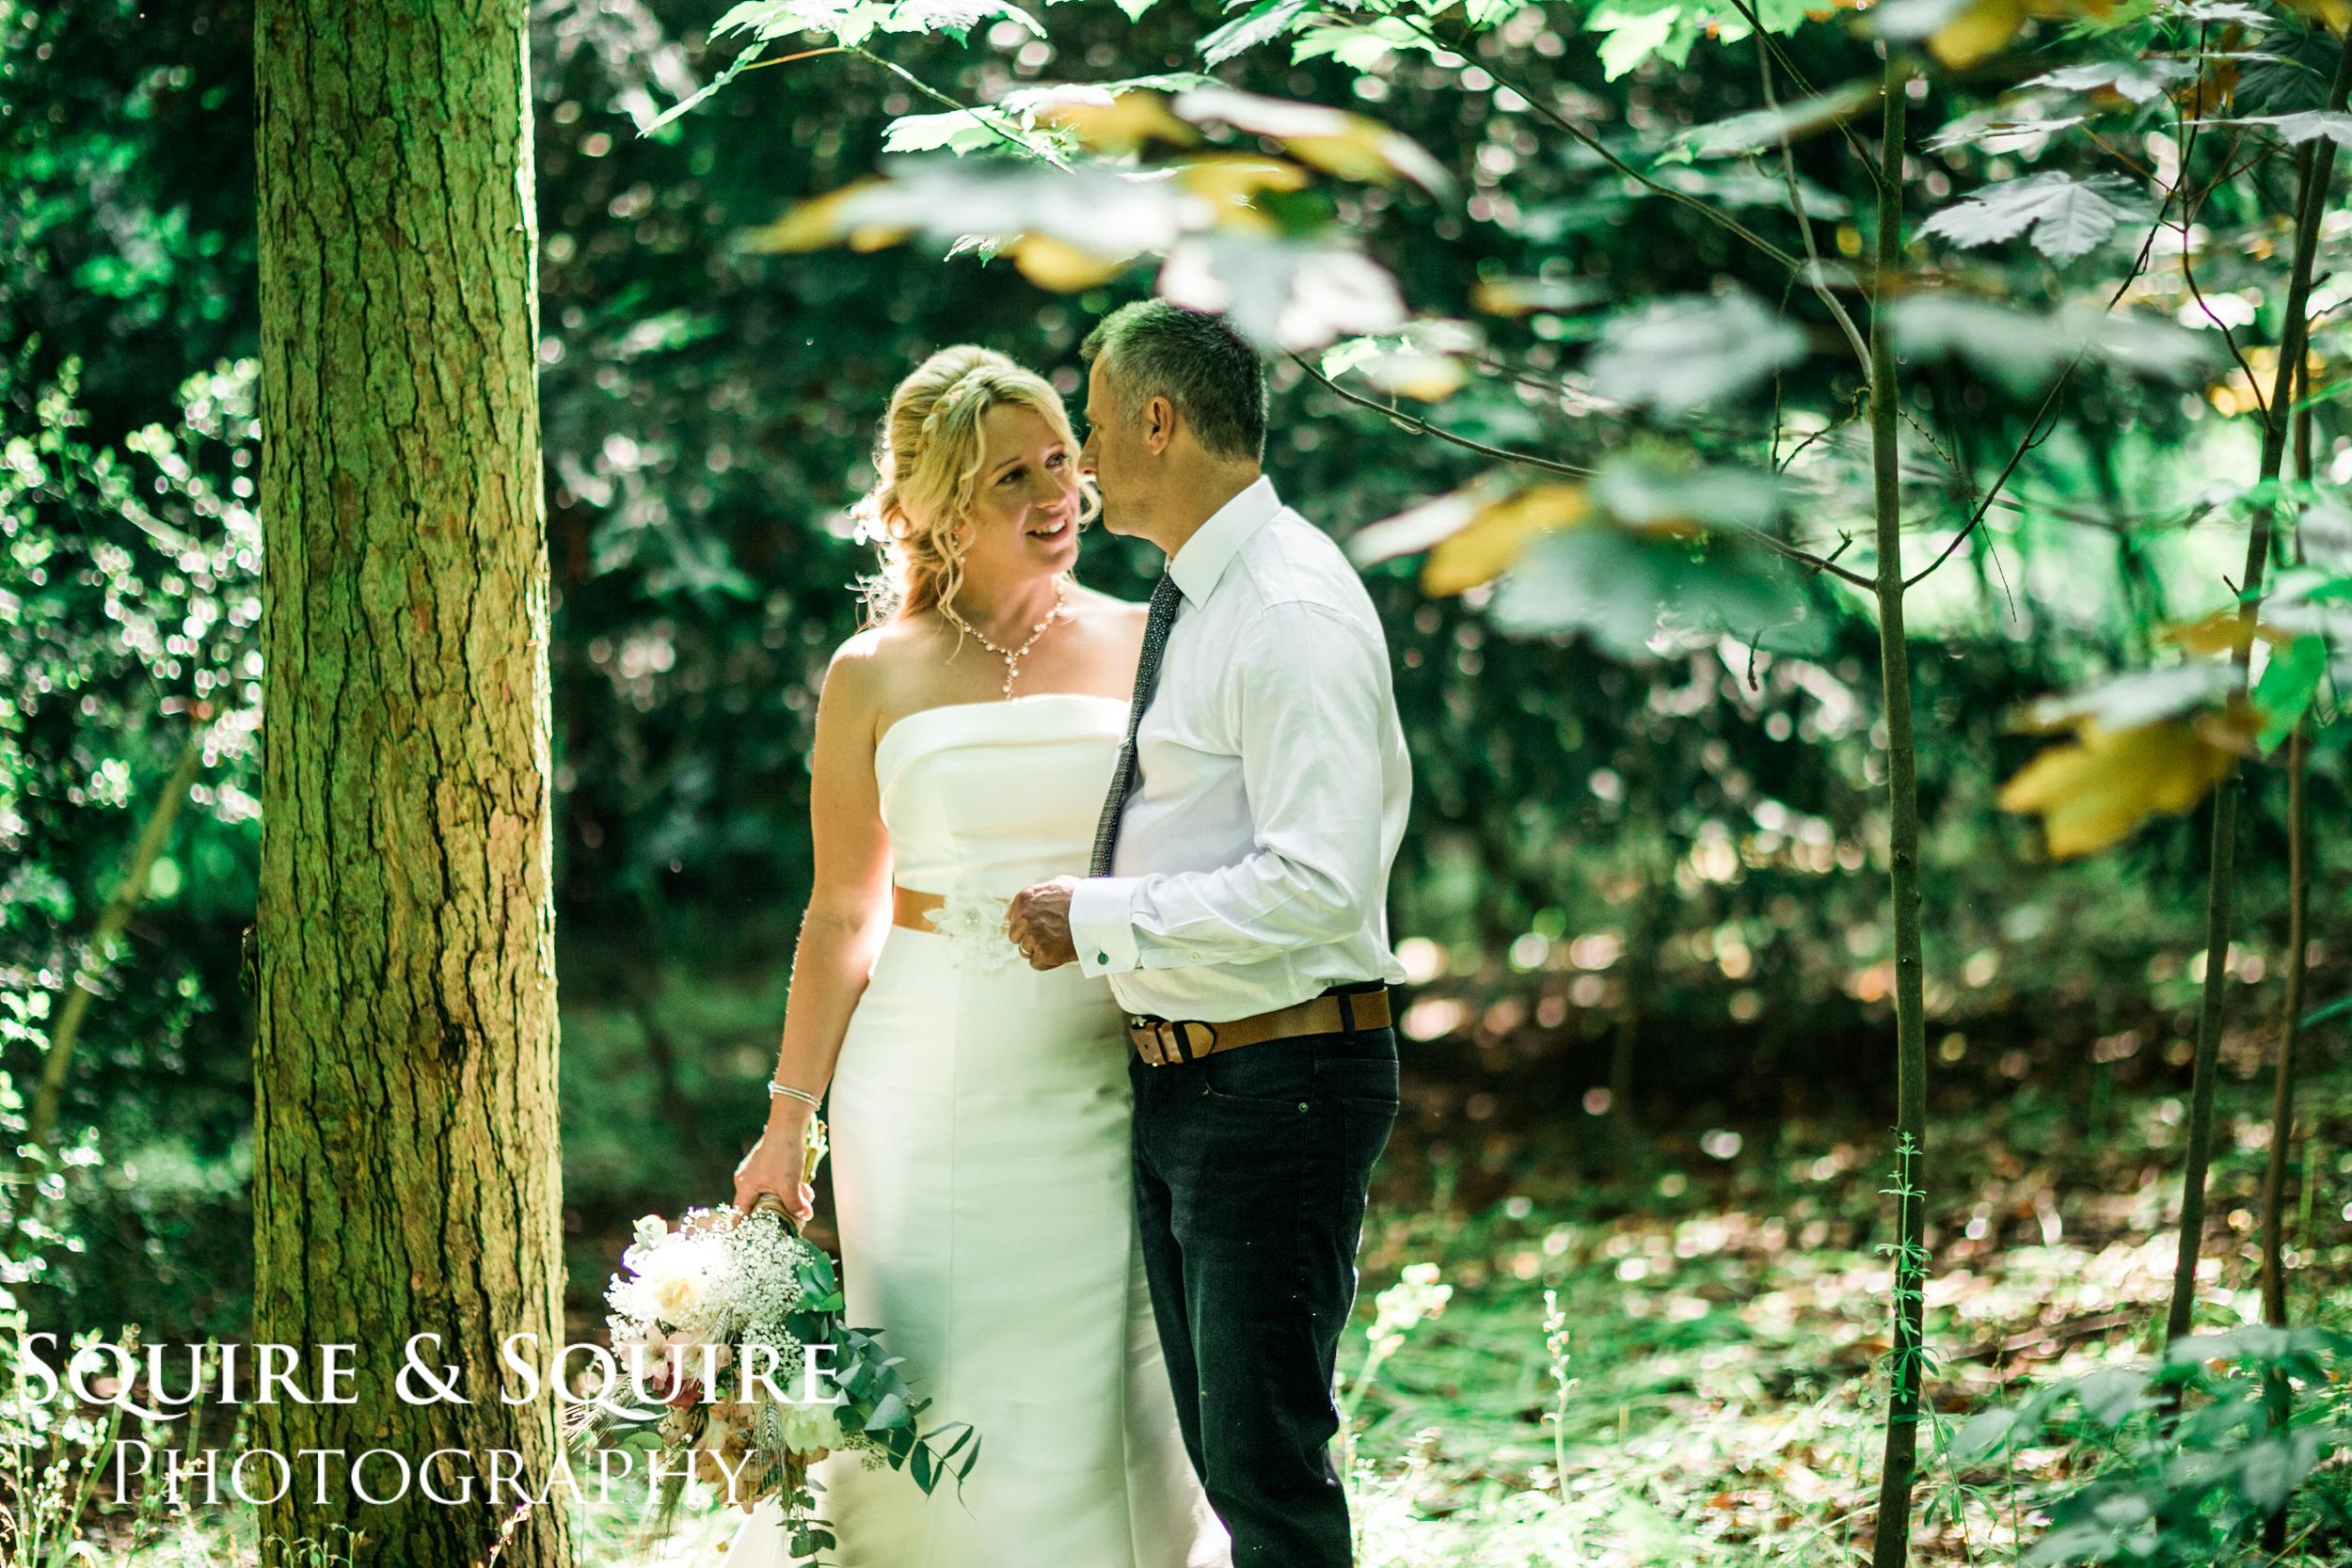 wedding_photography_catthorpe Manor (62 of 66).jpg